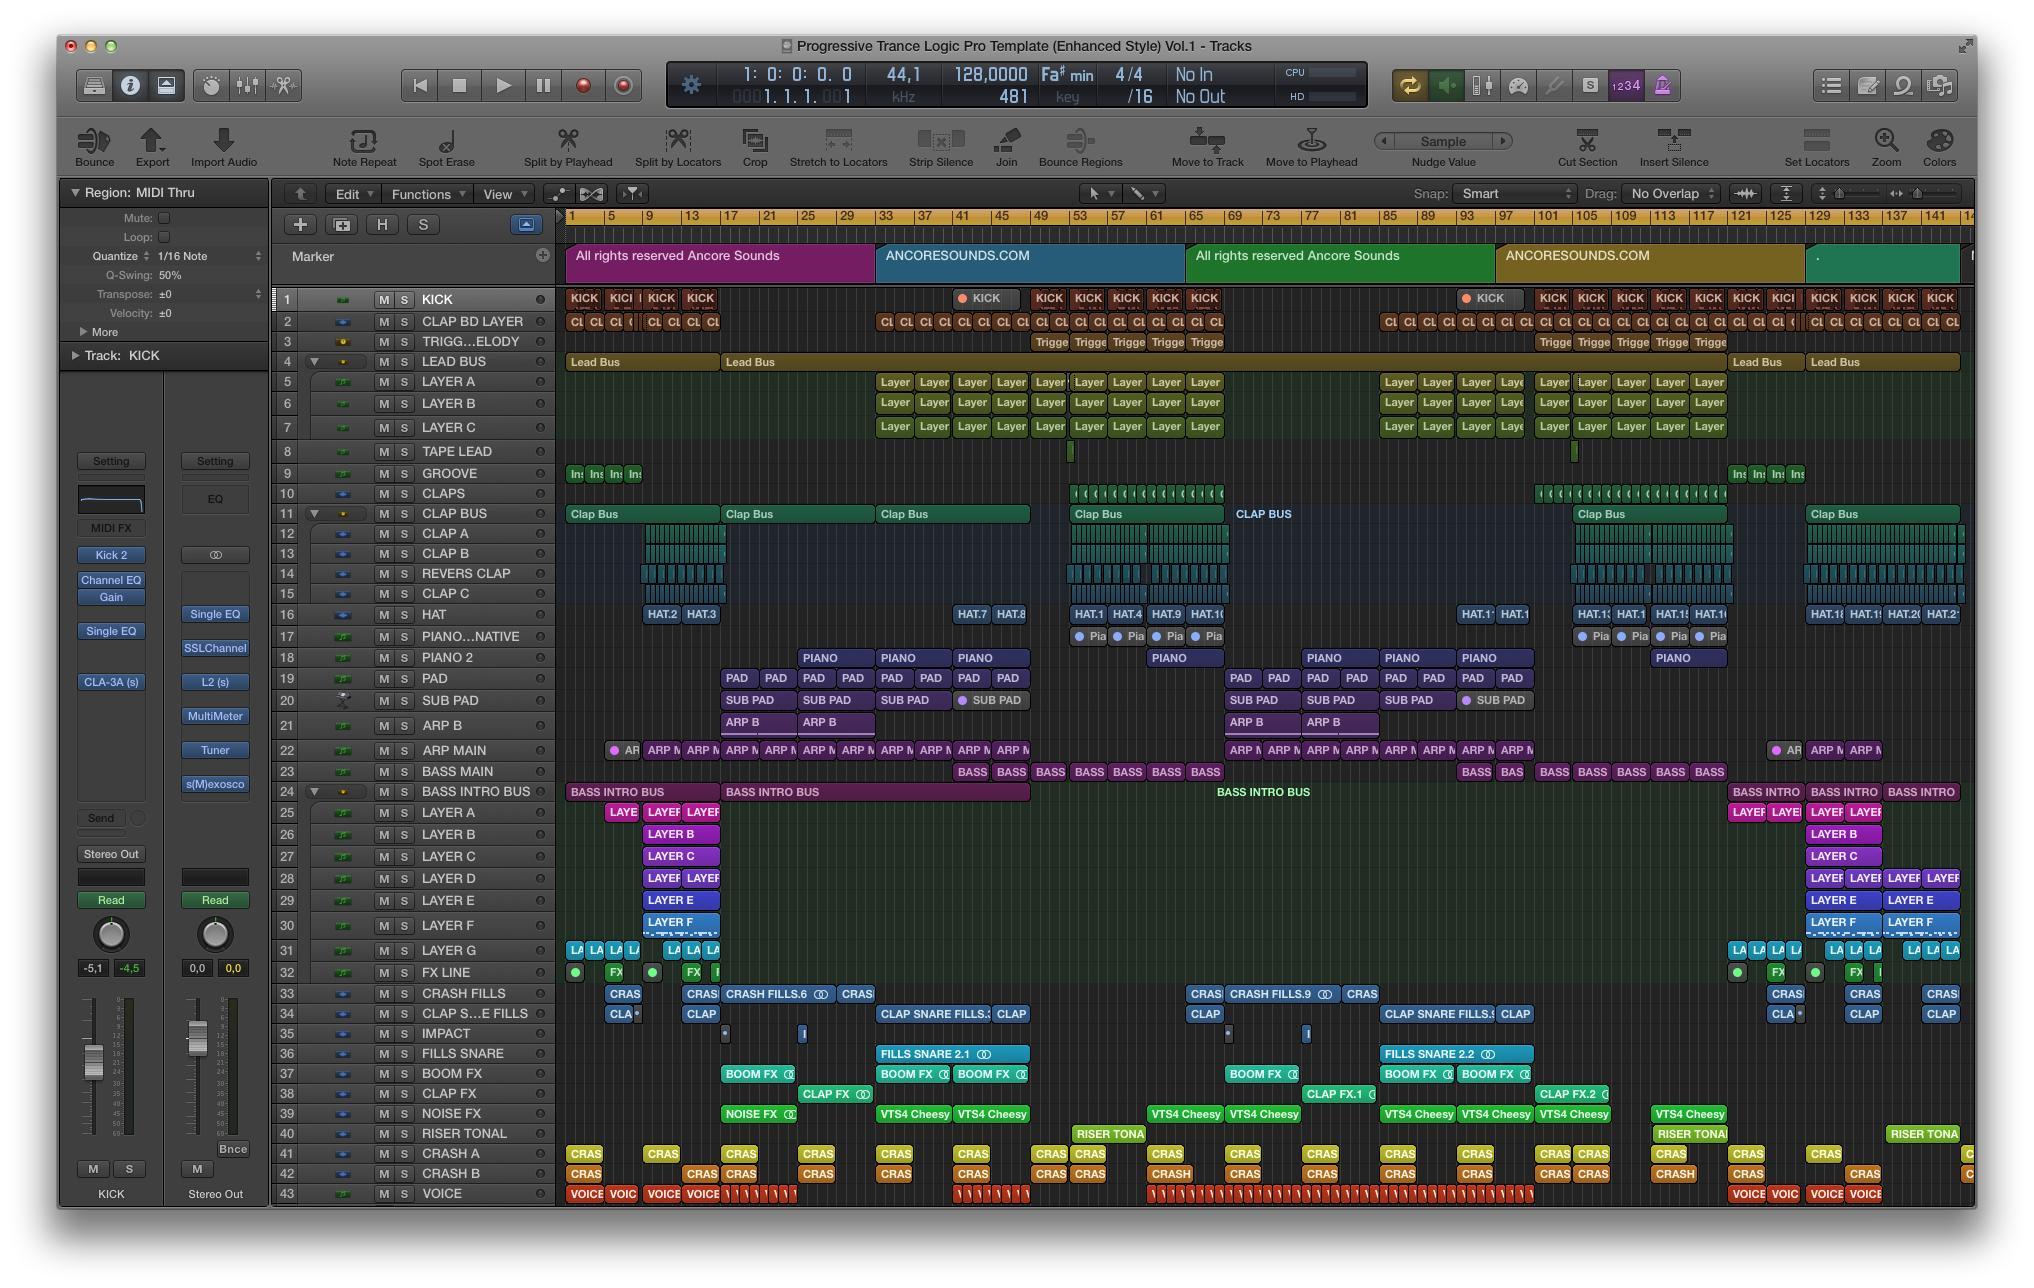 Progressive-Trance-Logic-Pro-Template-Enhanced-Style